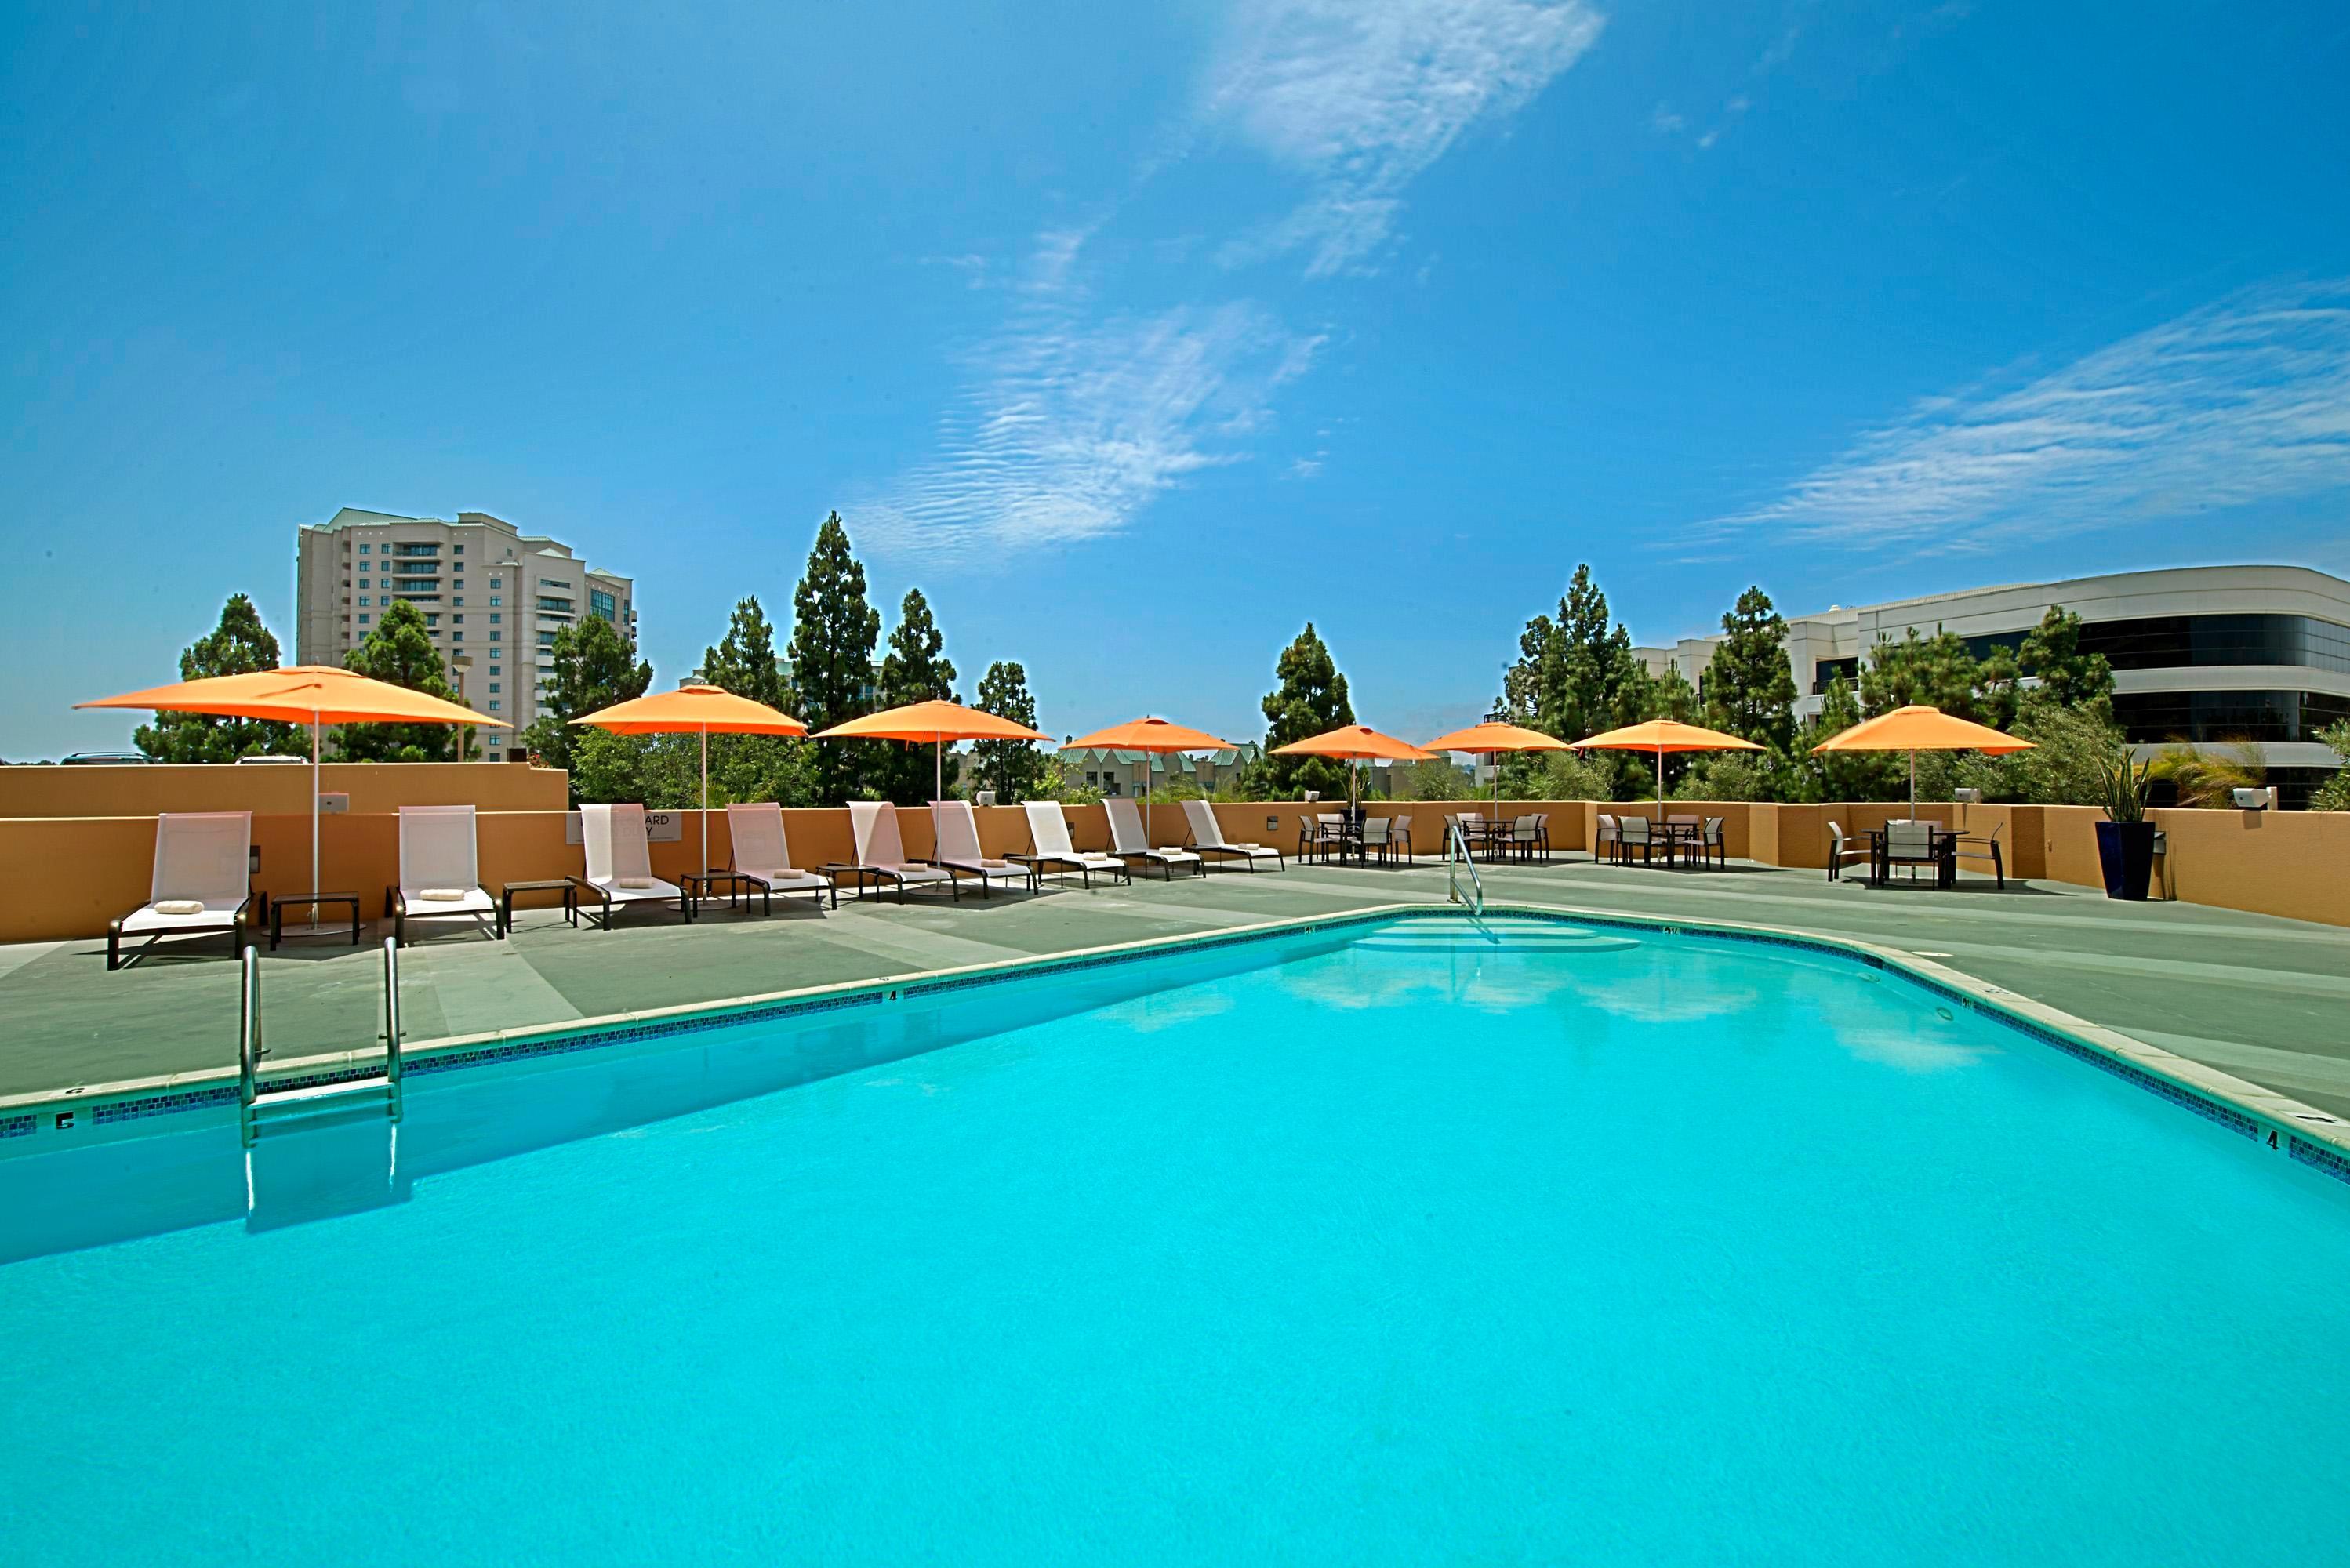 San Diego Marriott La Jolla image 1